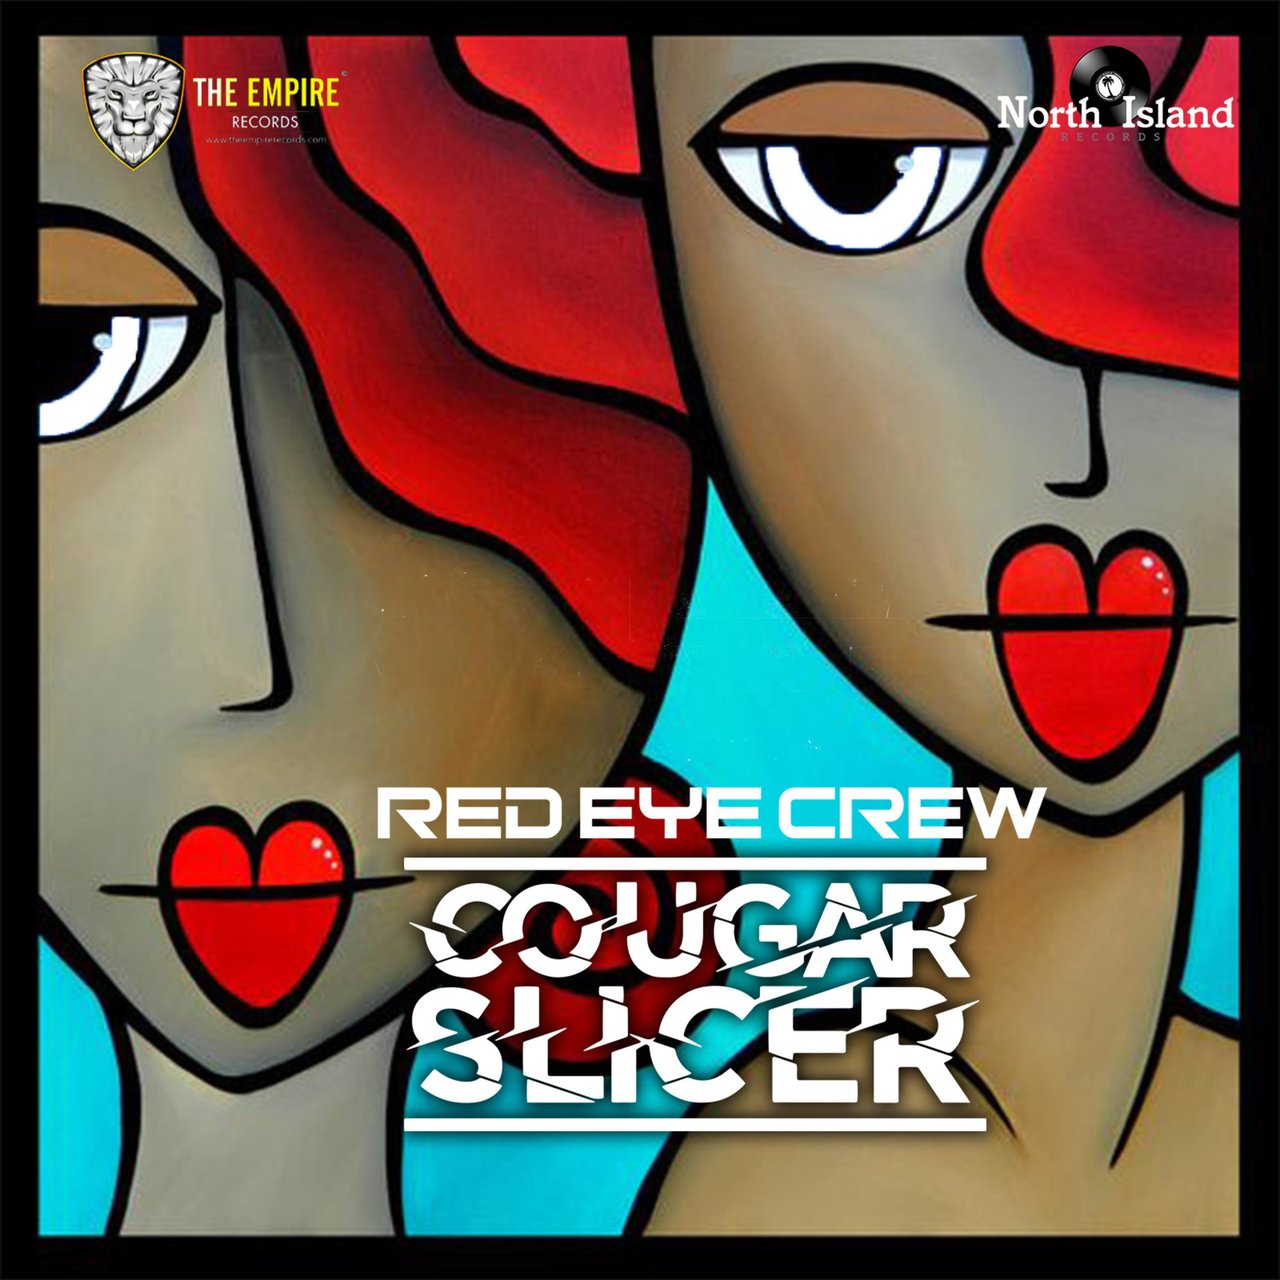 Red Eye Crew - Cougar Slicer